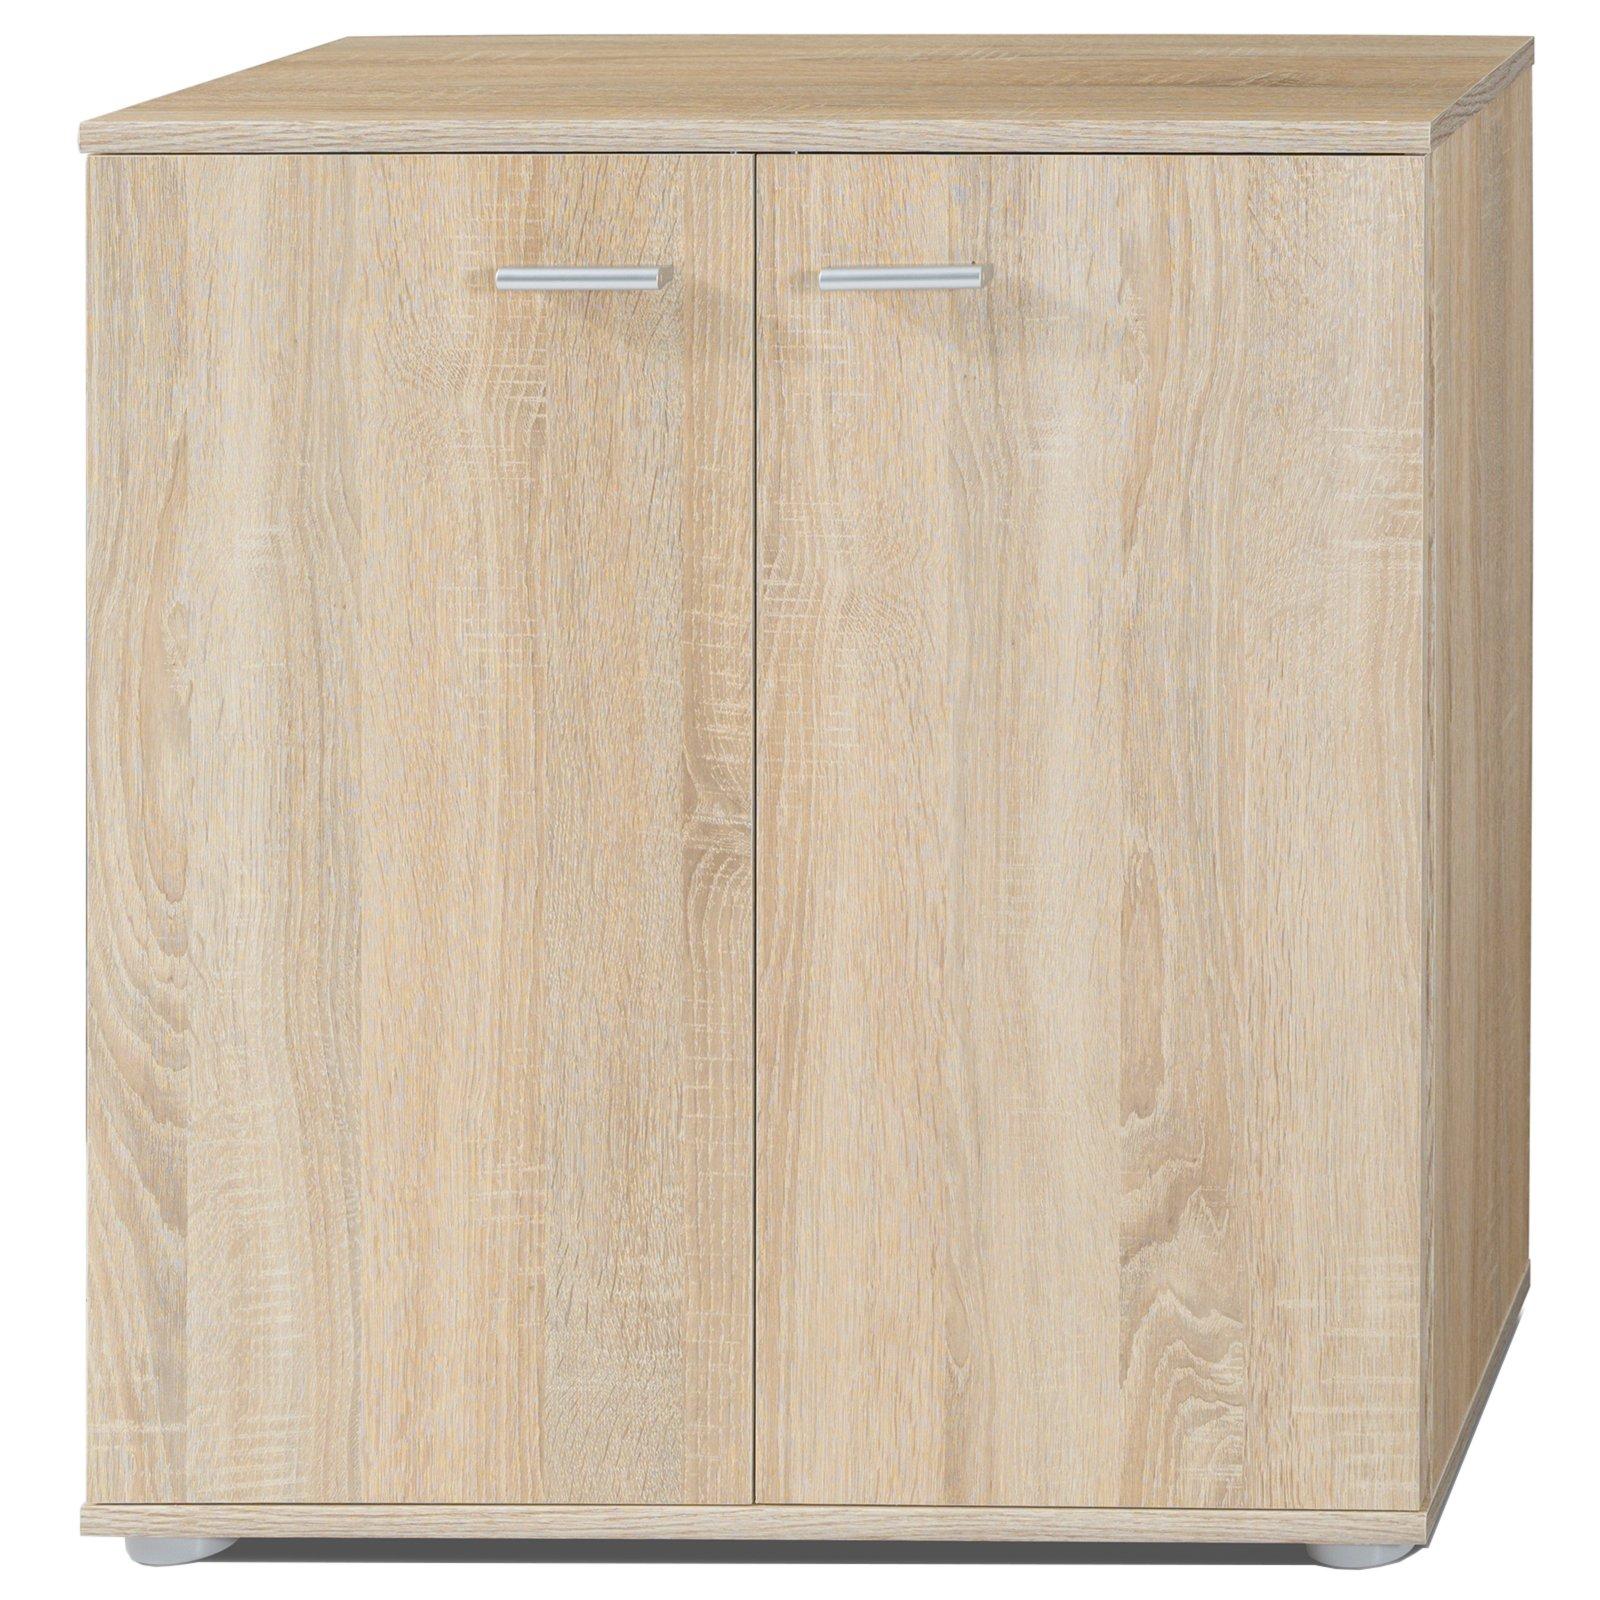 roller kommode mike 3 sonoma eiche 2 t ren 71 cm ebay. Black Bedroom Furniture Sets. Home Design Ideas